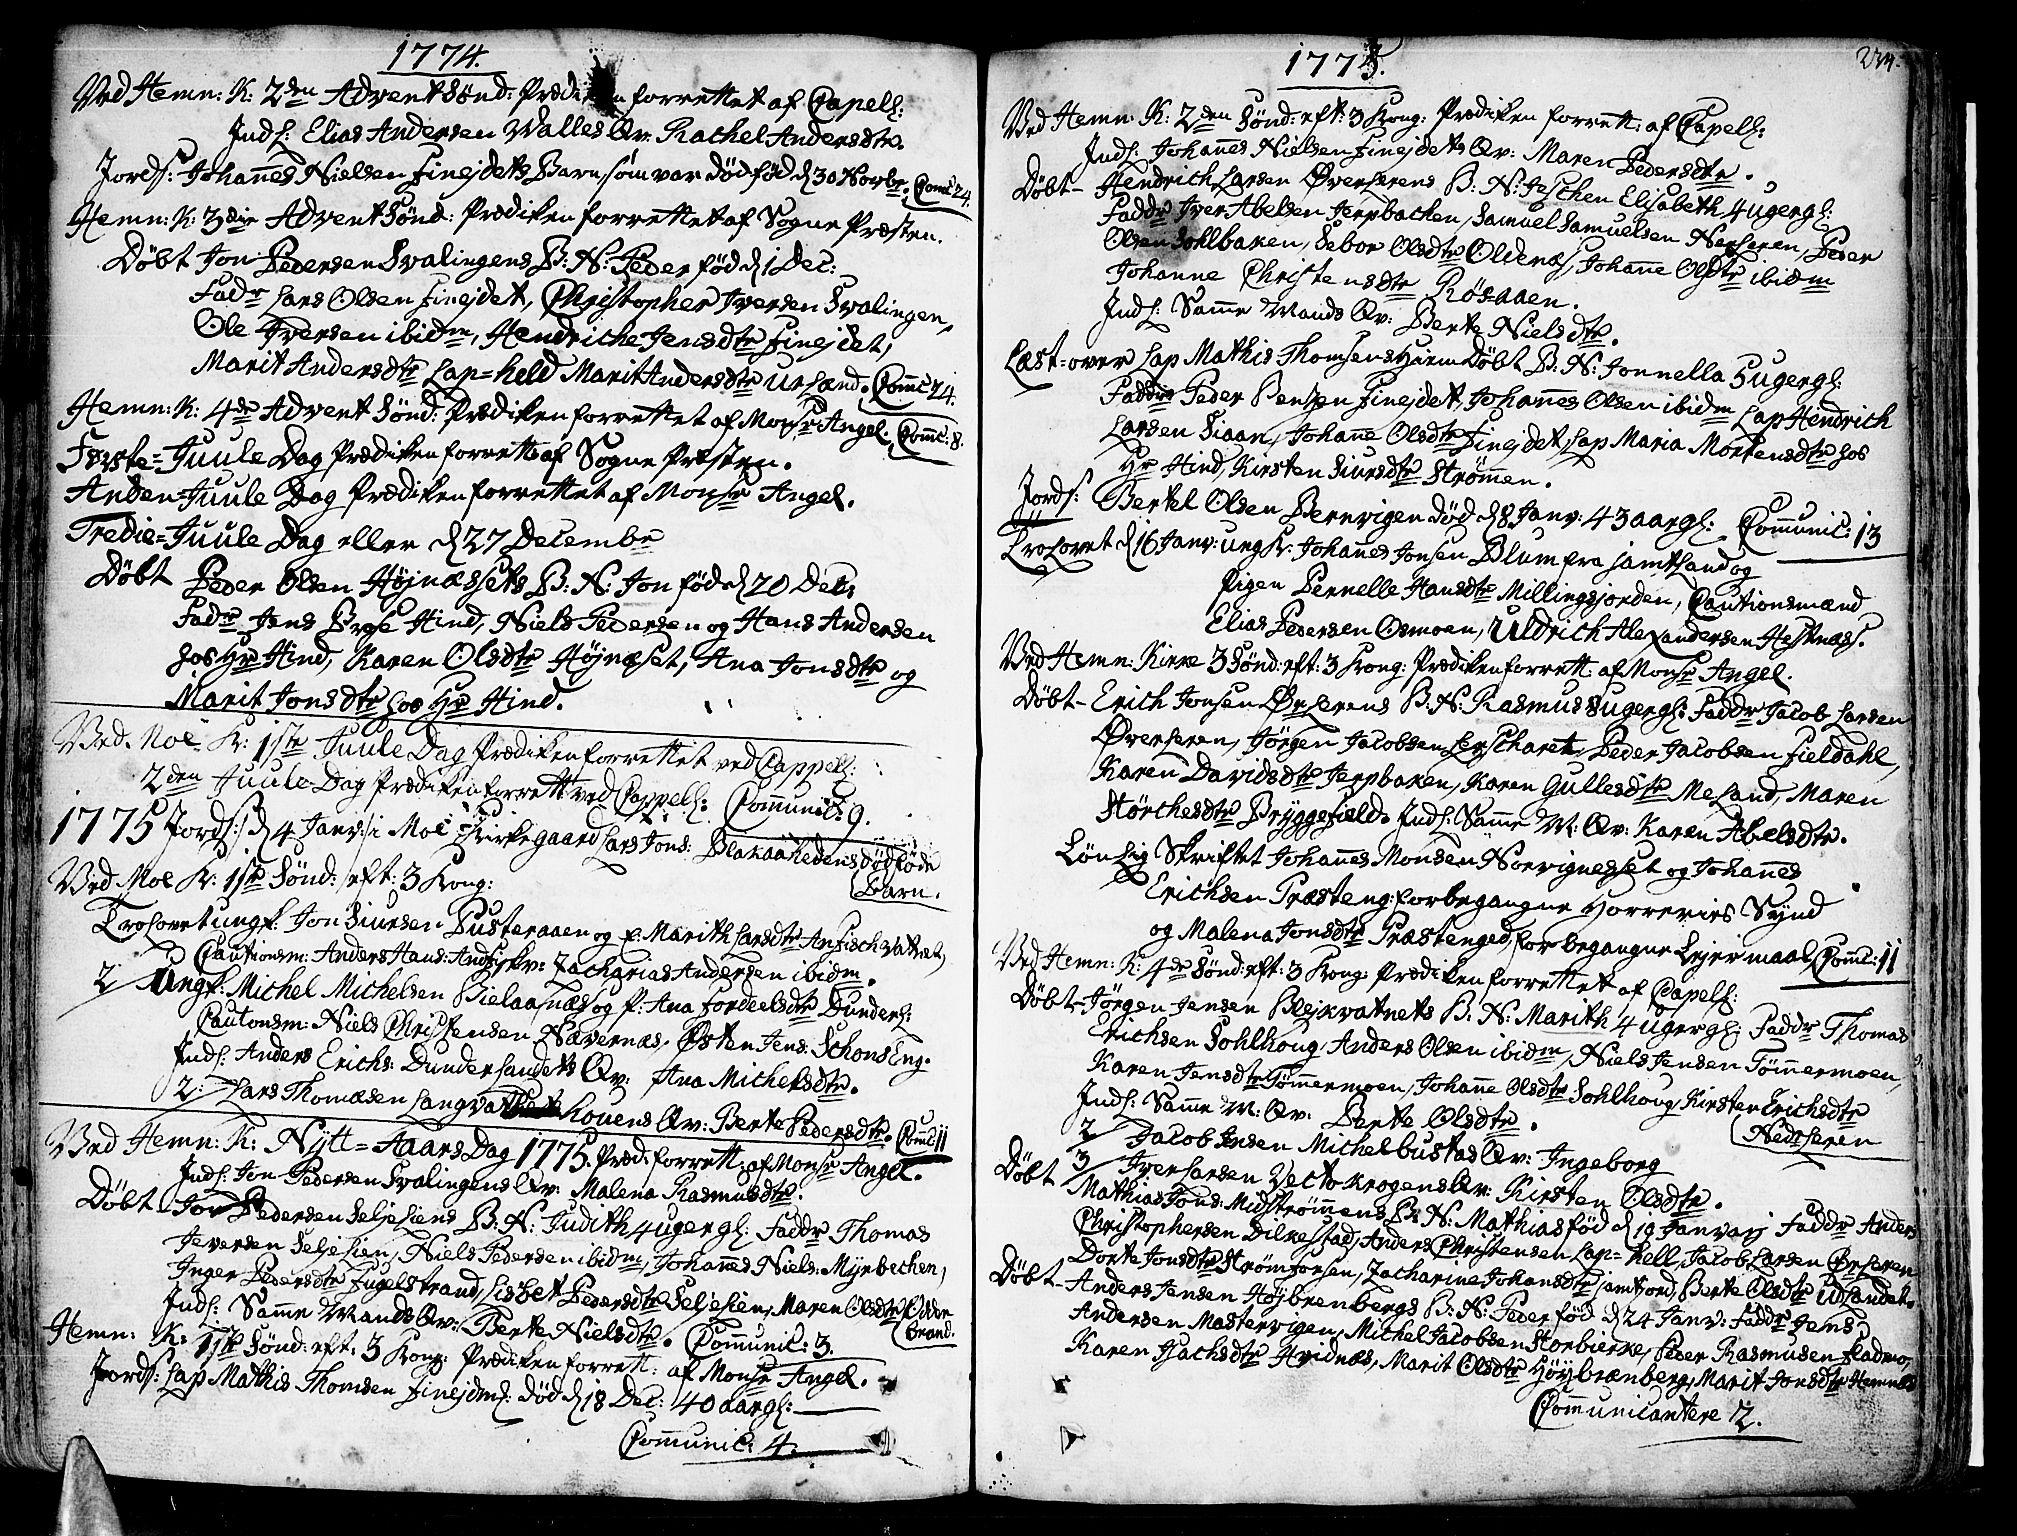 SAT, Ministerialprotokoller, klokkerbøker og fødselsregistre - Nordland, 825/L0348: Ministerialbok nr. 825A04, 1752-1788, s. 234